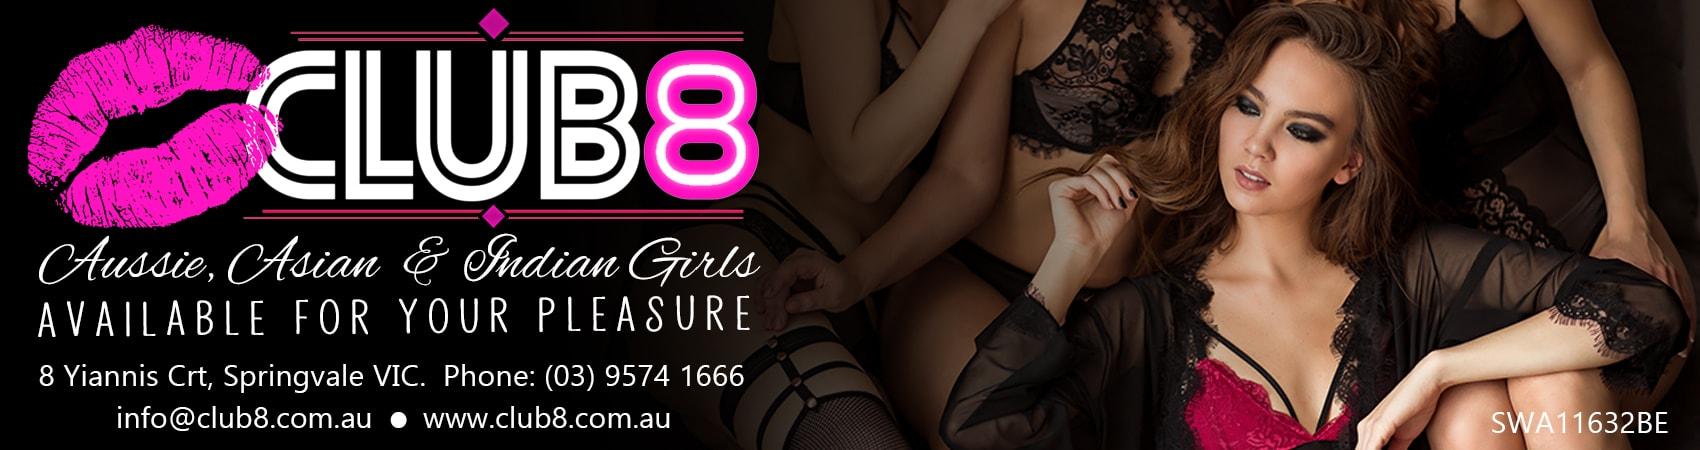 Club 8 Ad Melbourne